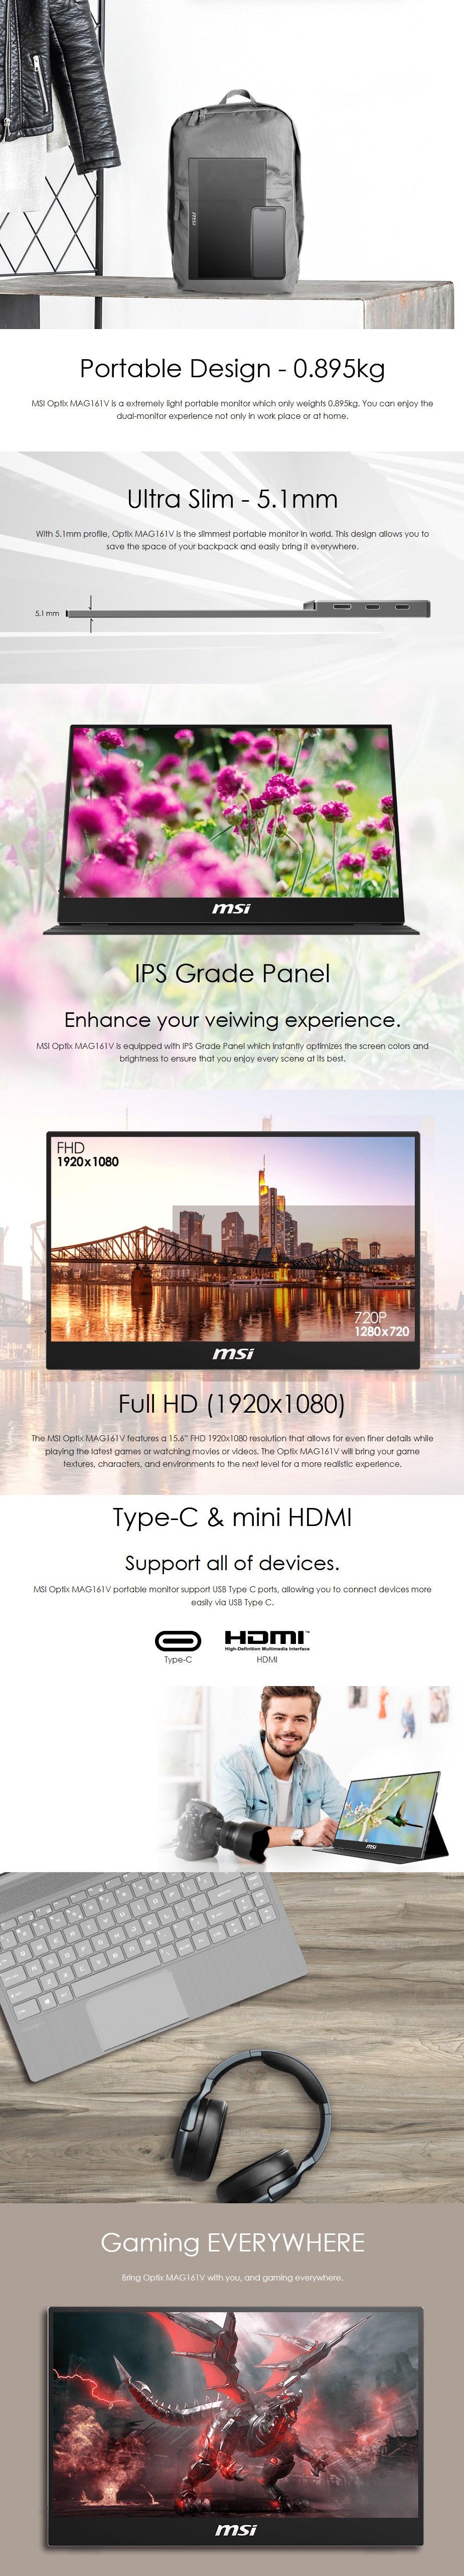 "MSI OPTIX MAG161V 15.6"" Full HD Portable USB-C IPS Monitor - Overview 1"